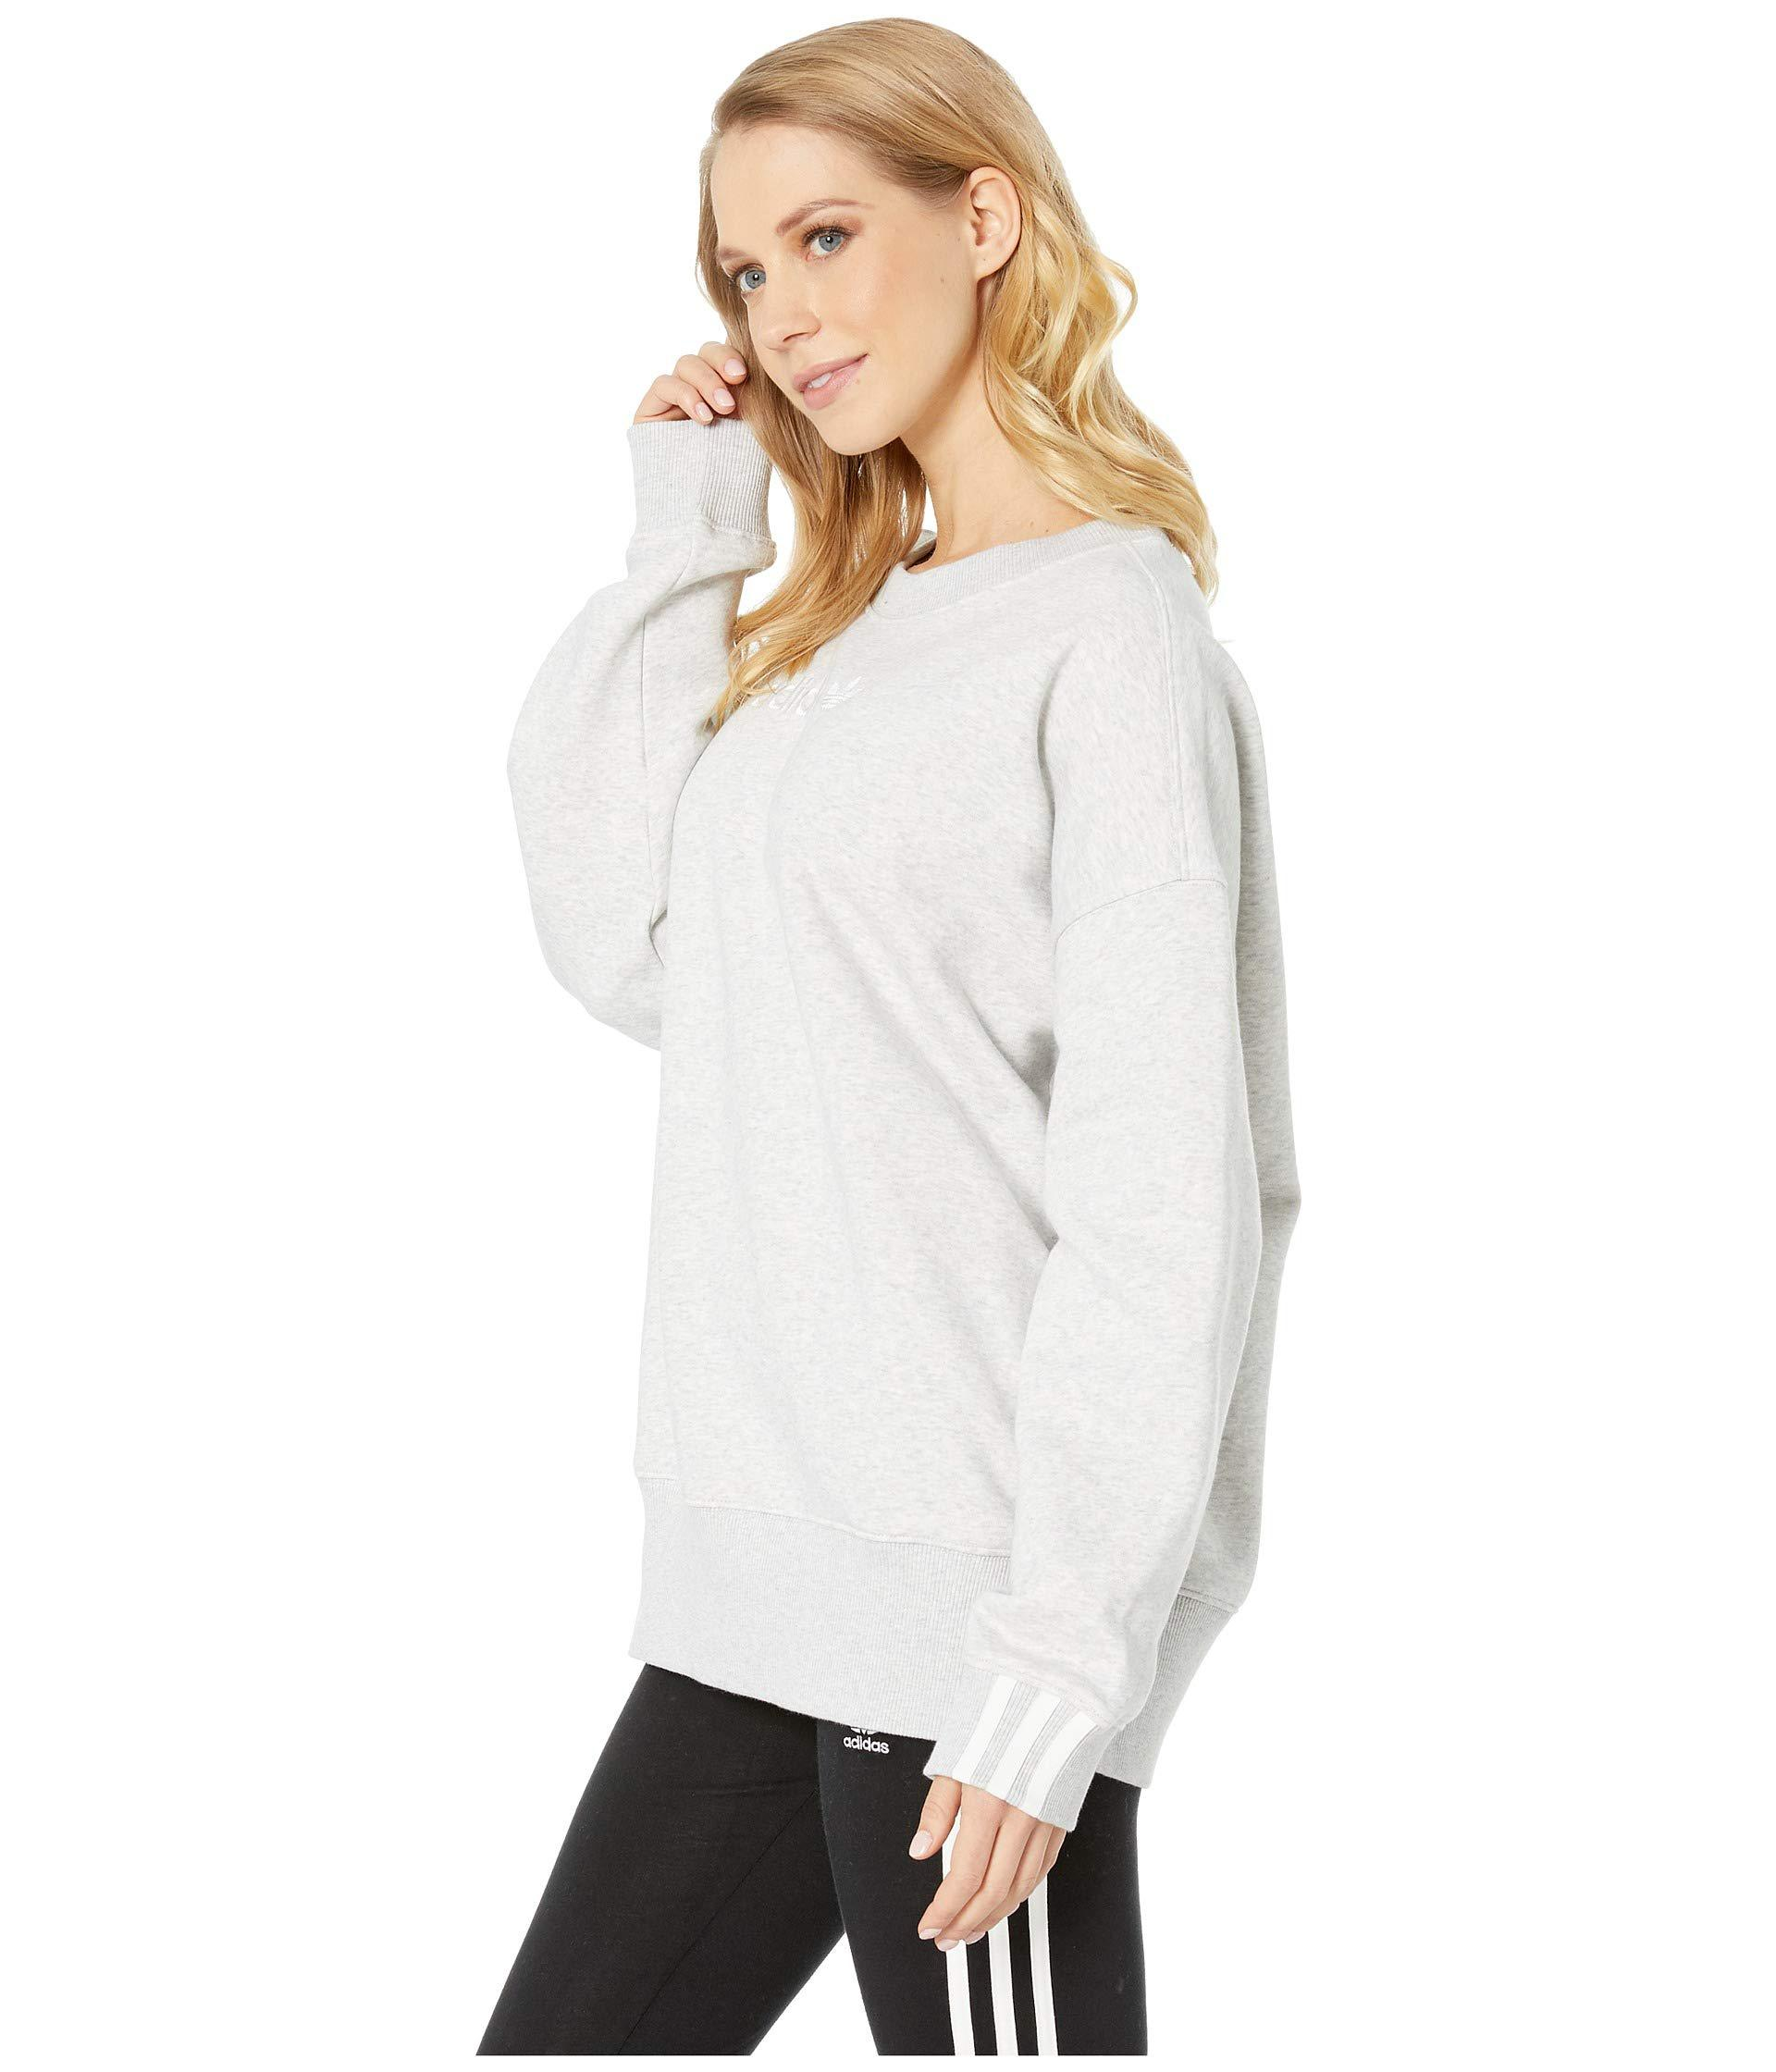 Lyst Sweatshirt Heather Originals light Adidas Coeeze Grey gTgrvnB